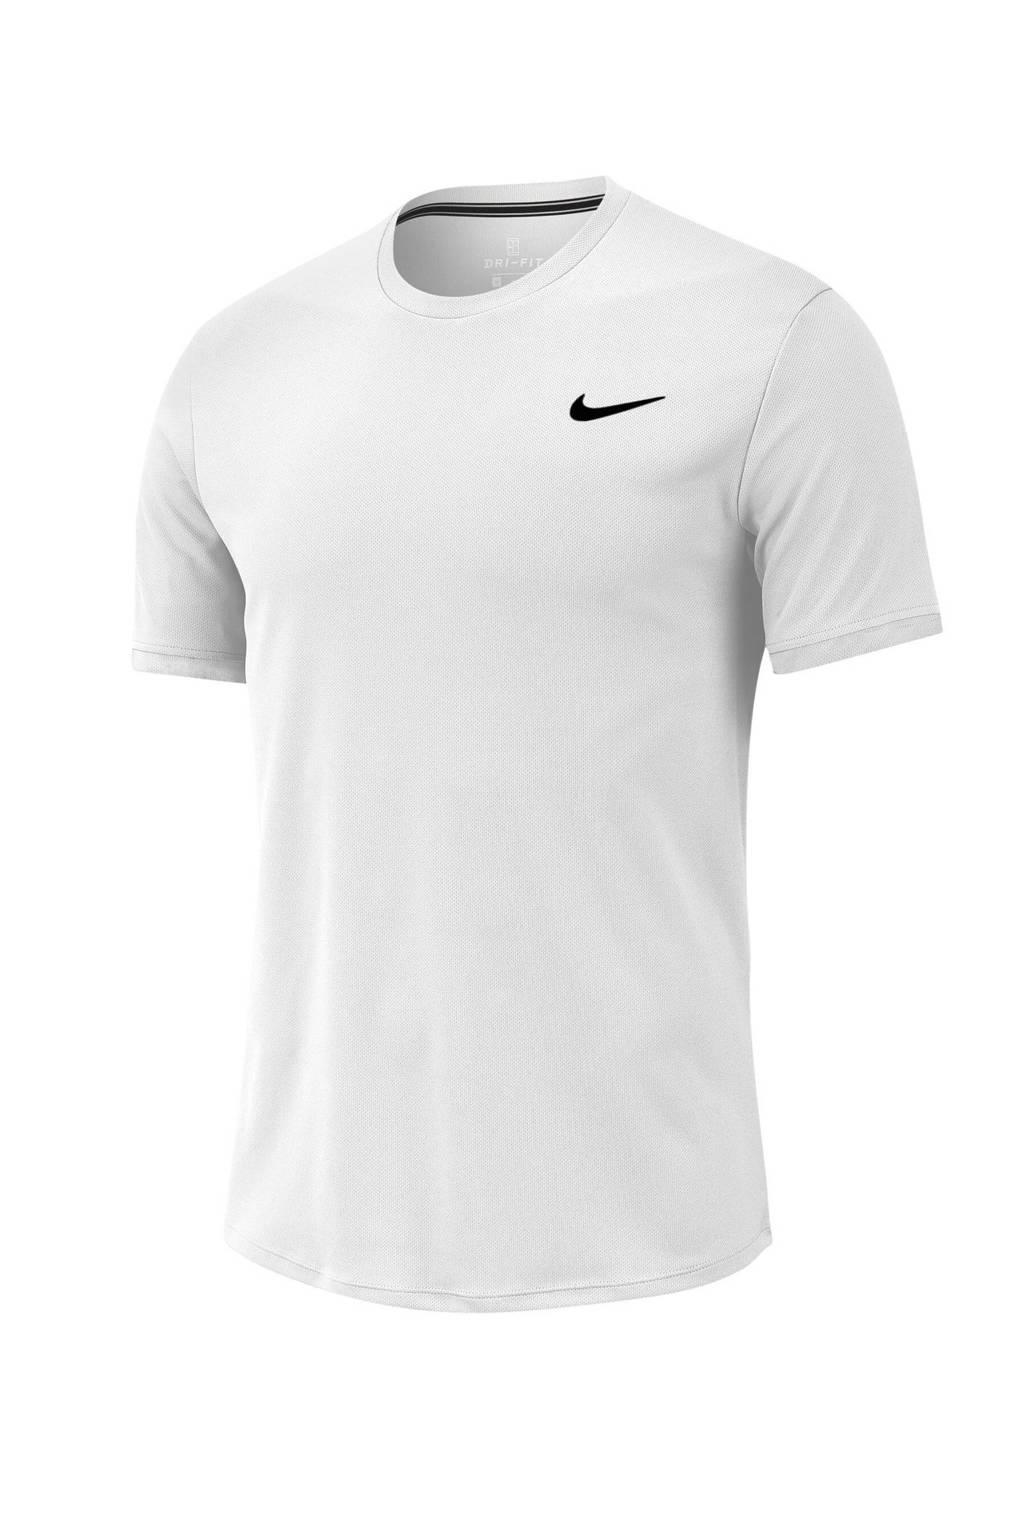 Nike   Sport T-shirt wit, Wit